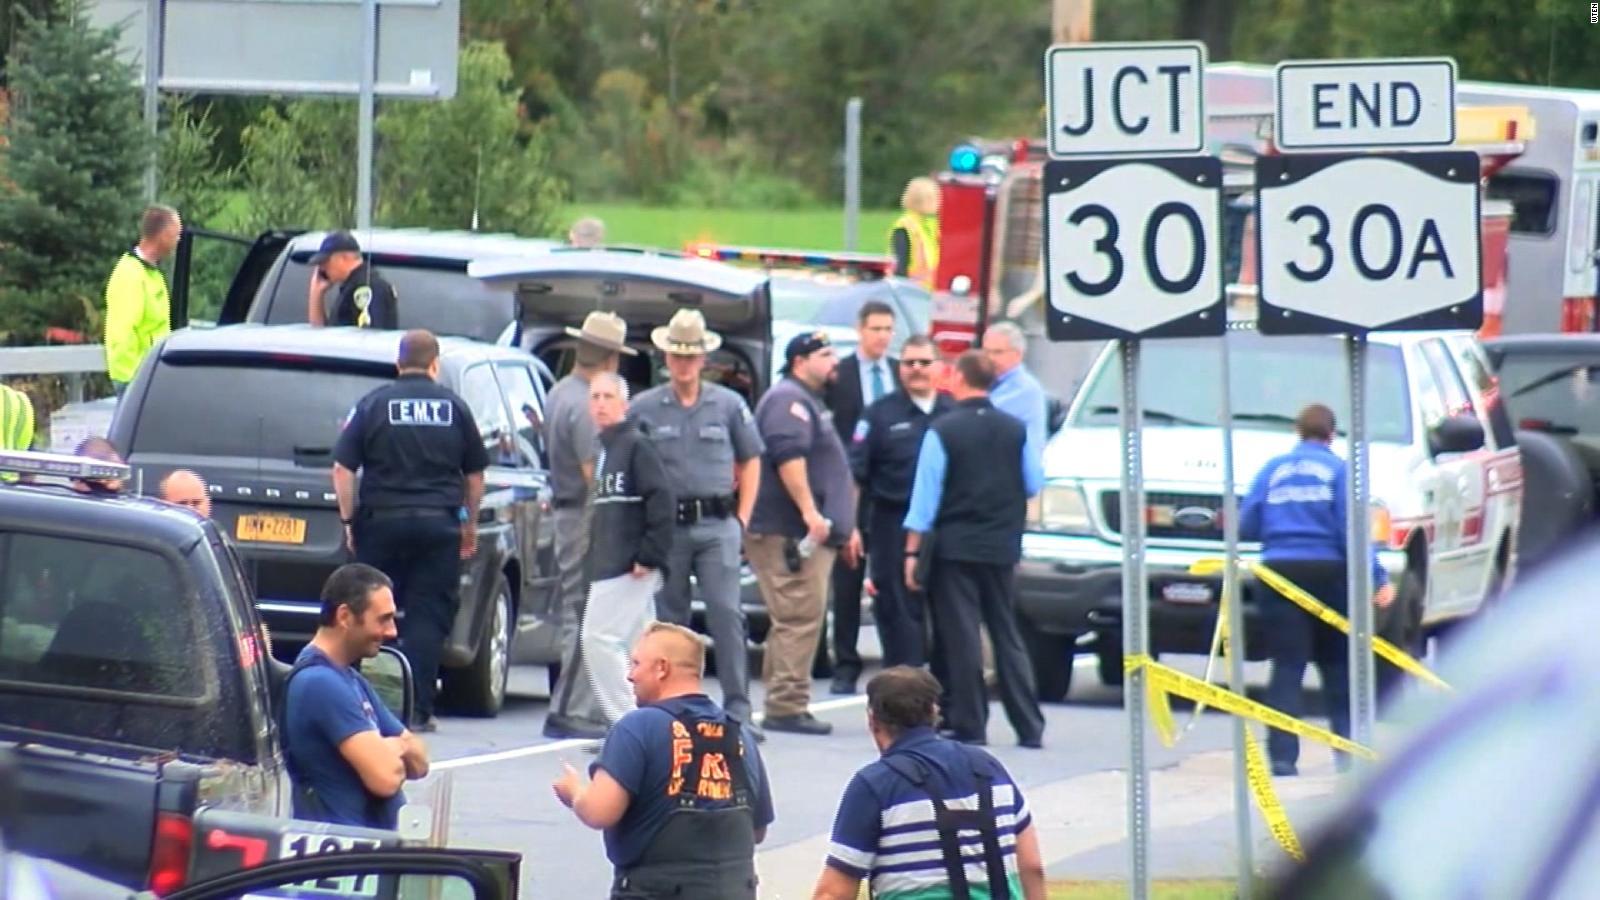 Limo crash in New York kills 20 people